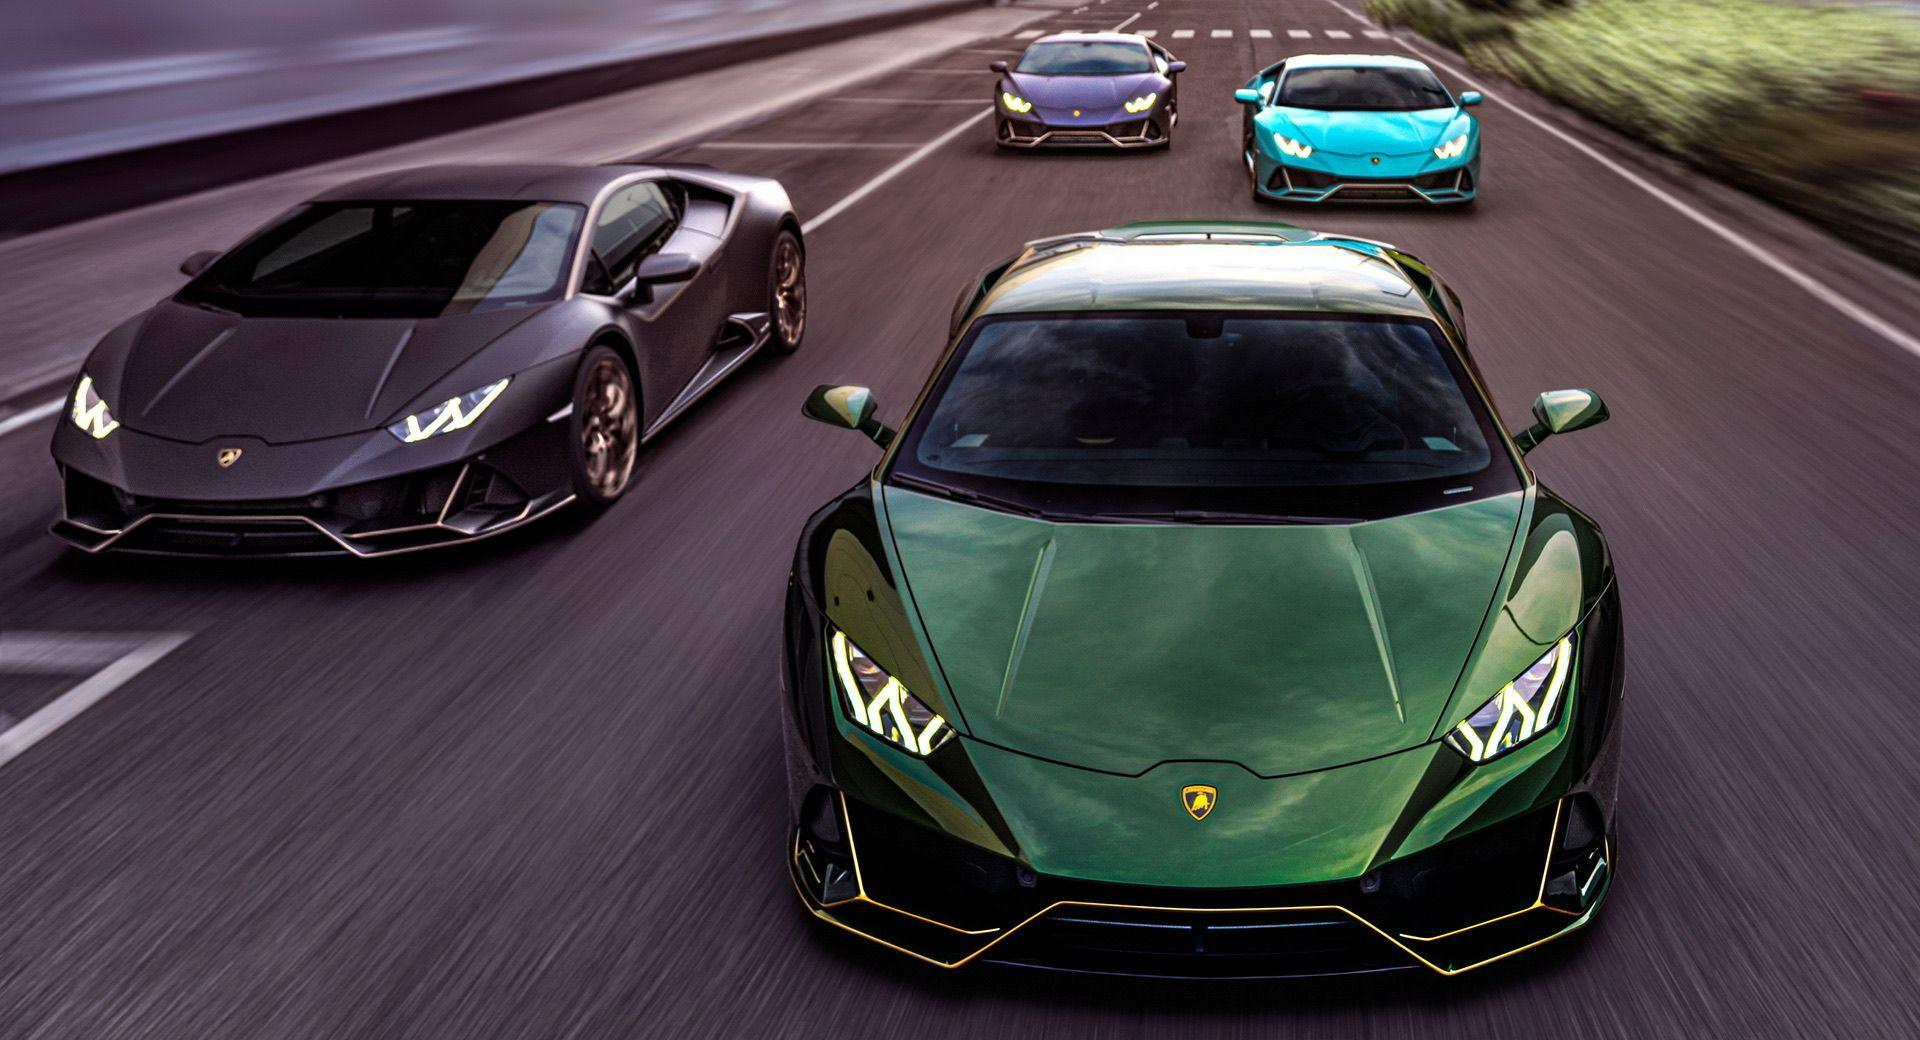 Lamborghini-Huracan-for-Mexico1_1920x1040